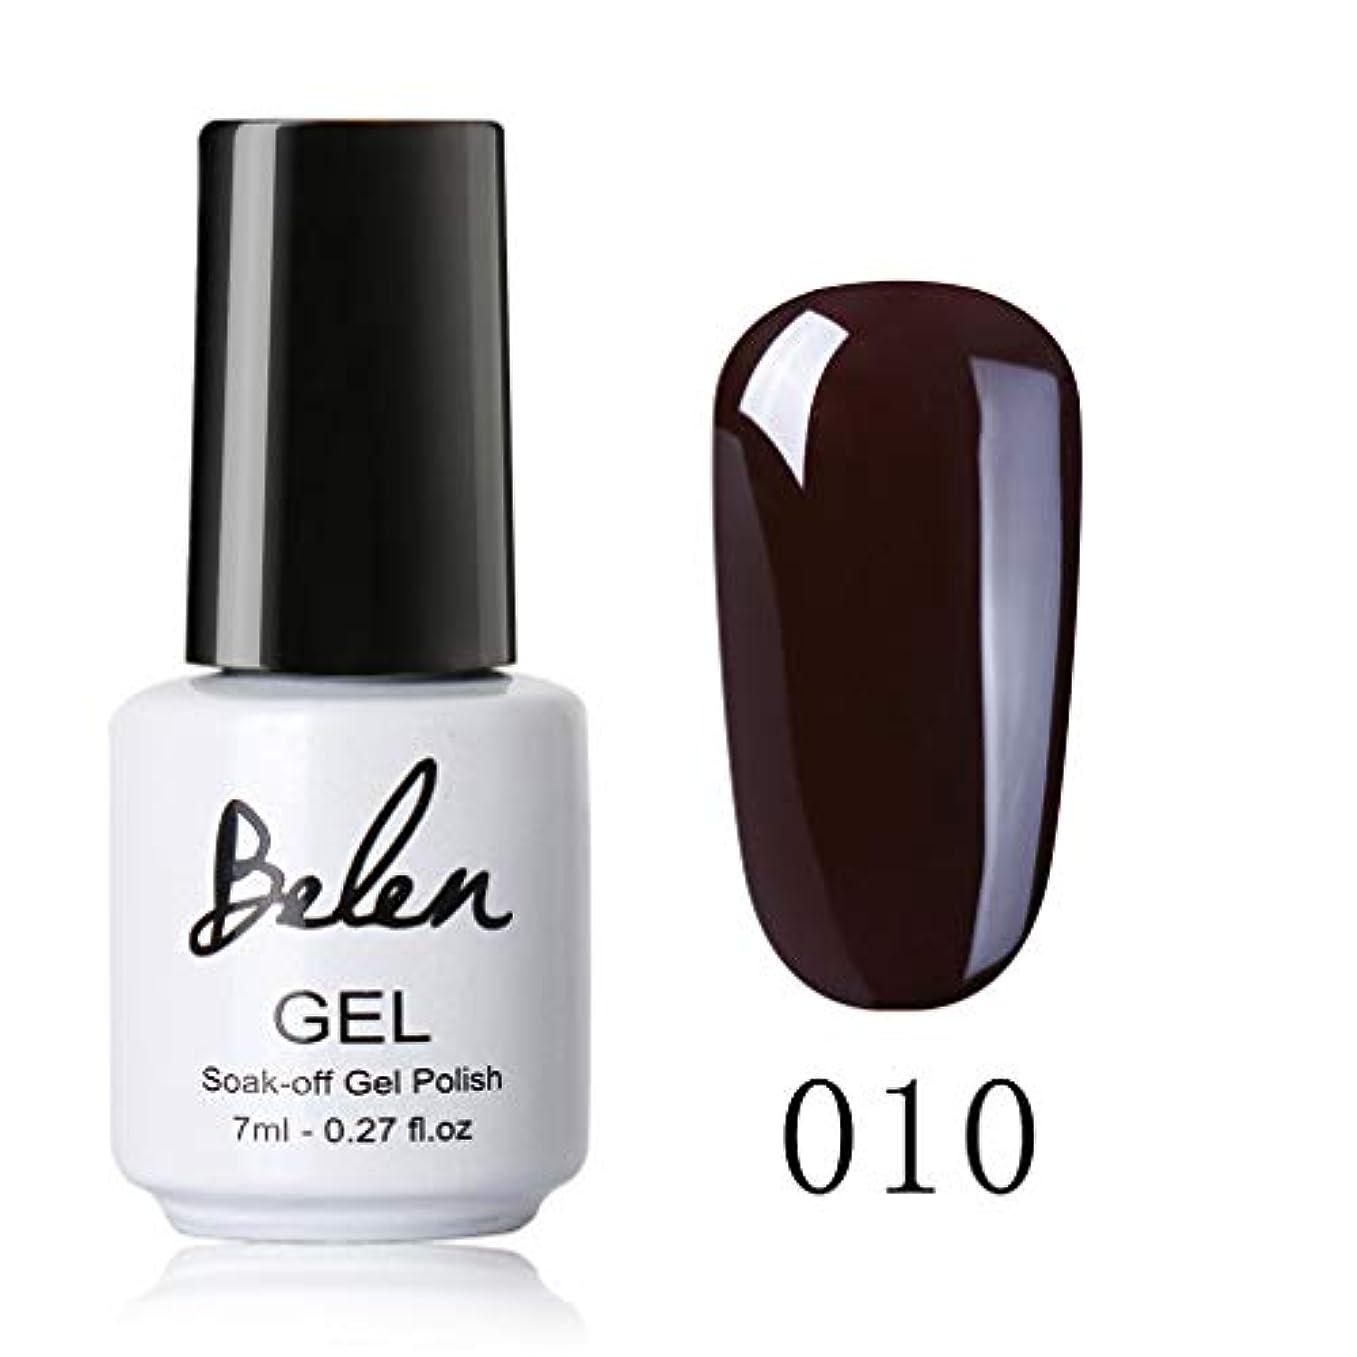 Belen ジェルネイル カラージェル ブラウン系 1色入り 7ml 【全12色選択可】